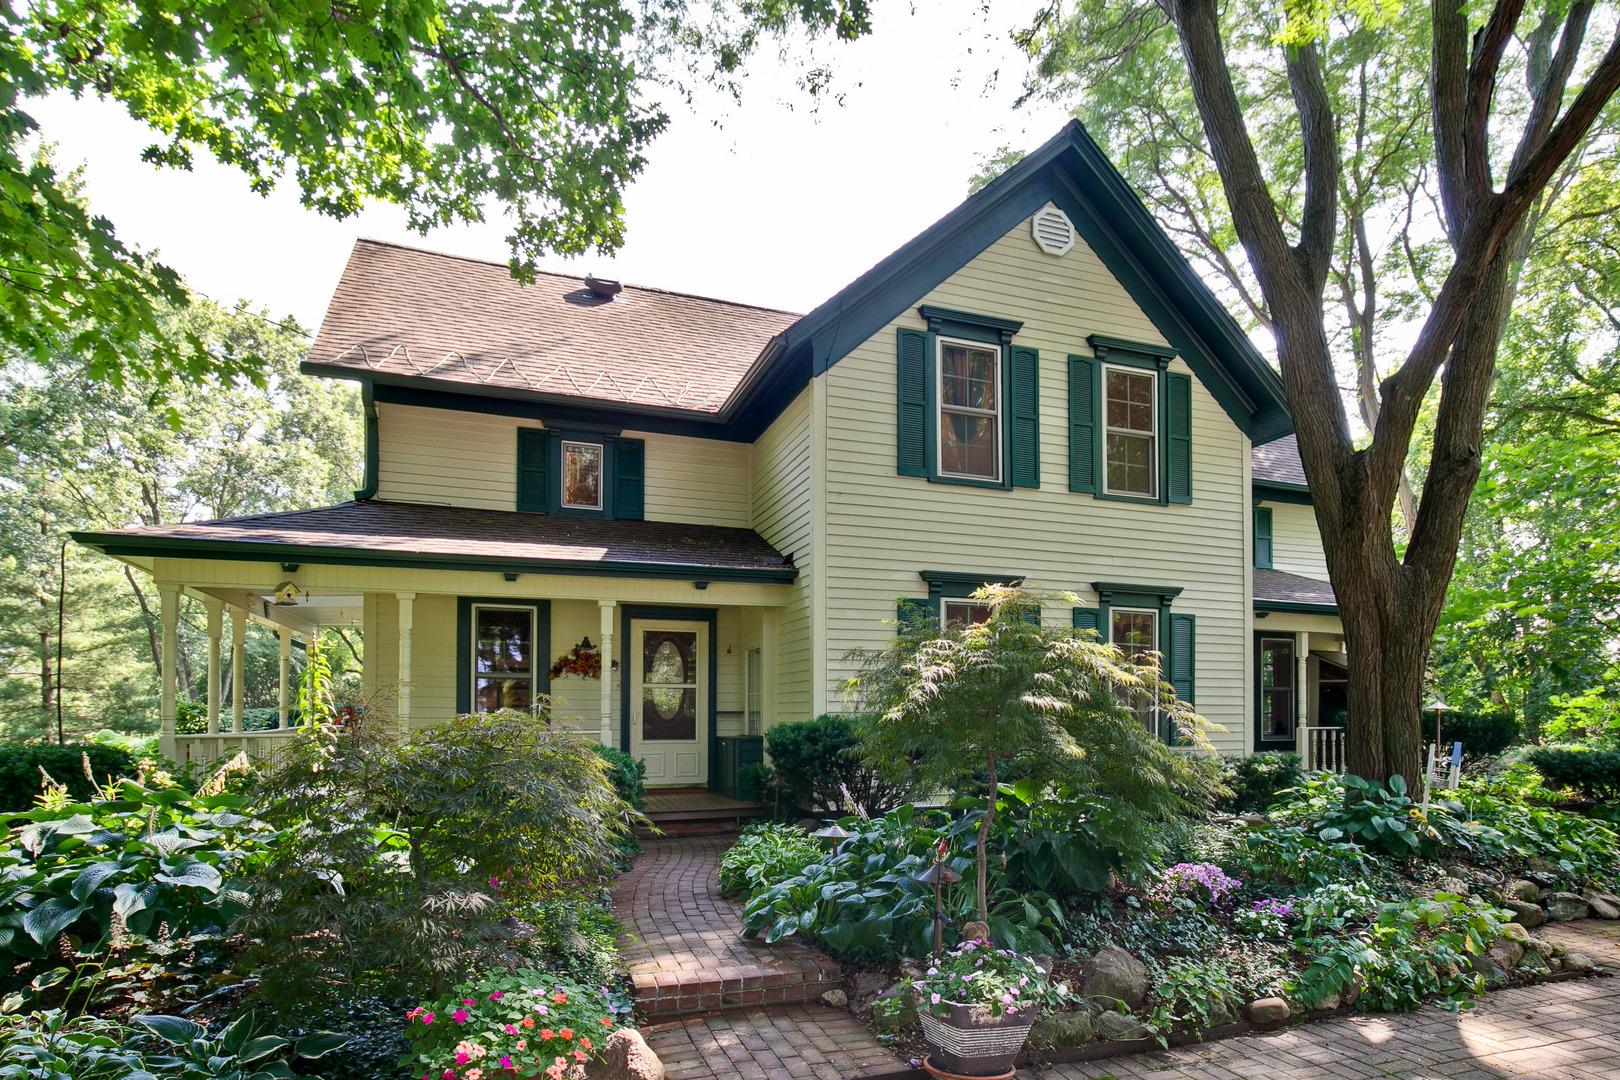 20245 West Indian Creek Road, Hawthorn Woods, Illinois 60060